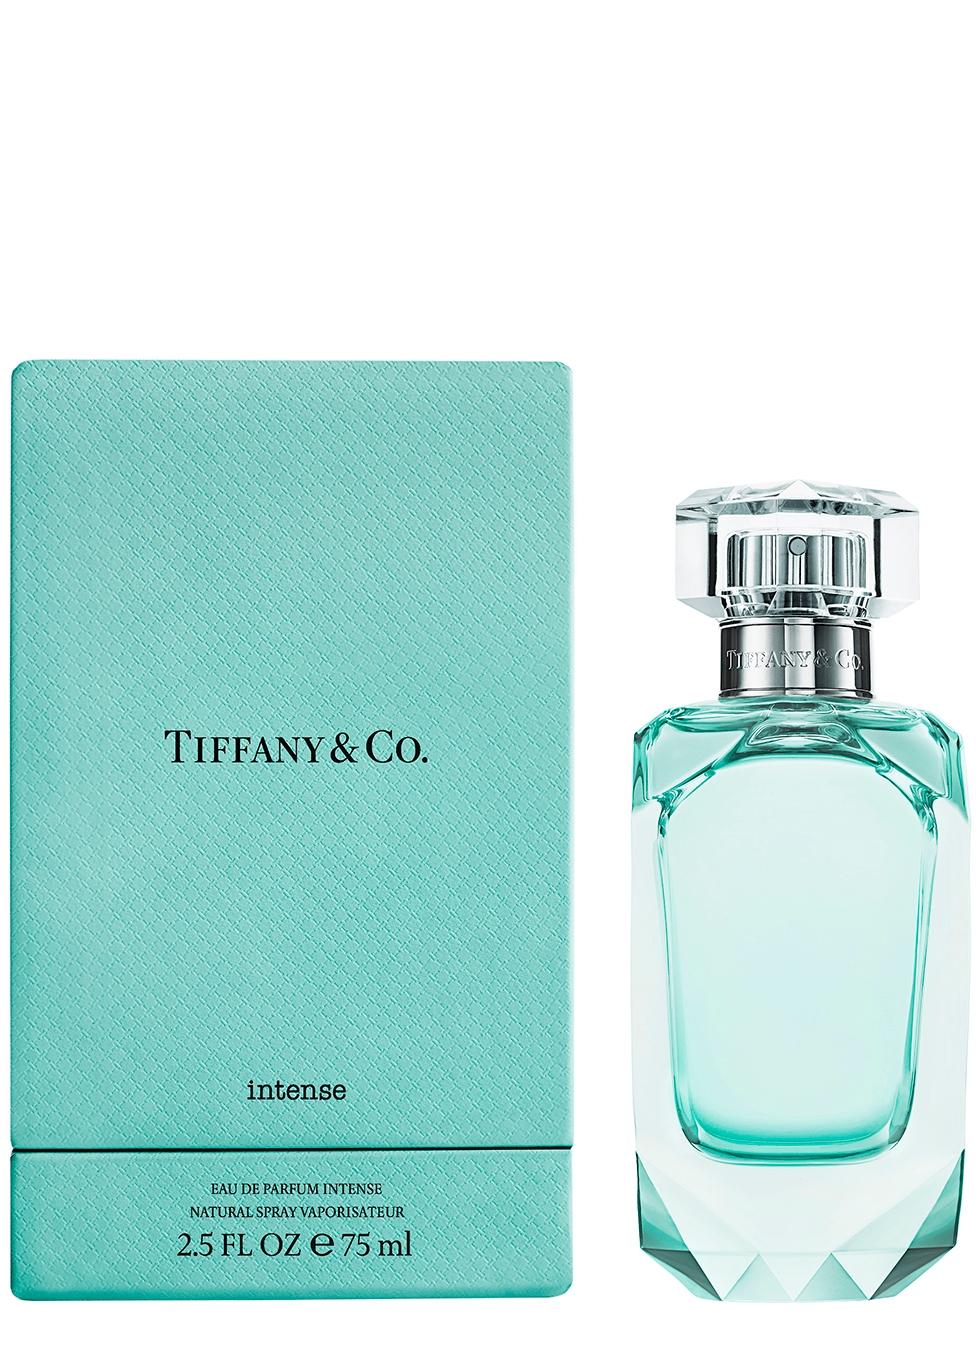 Tiffany Intense Eau De Parfum 75ml - TIFFANY